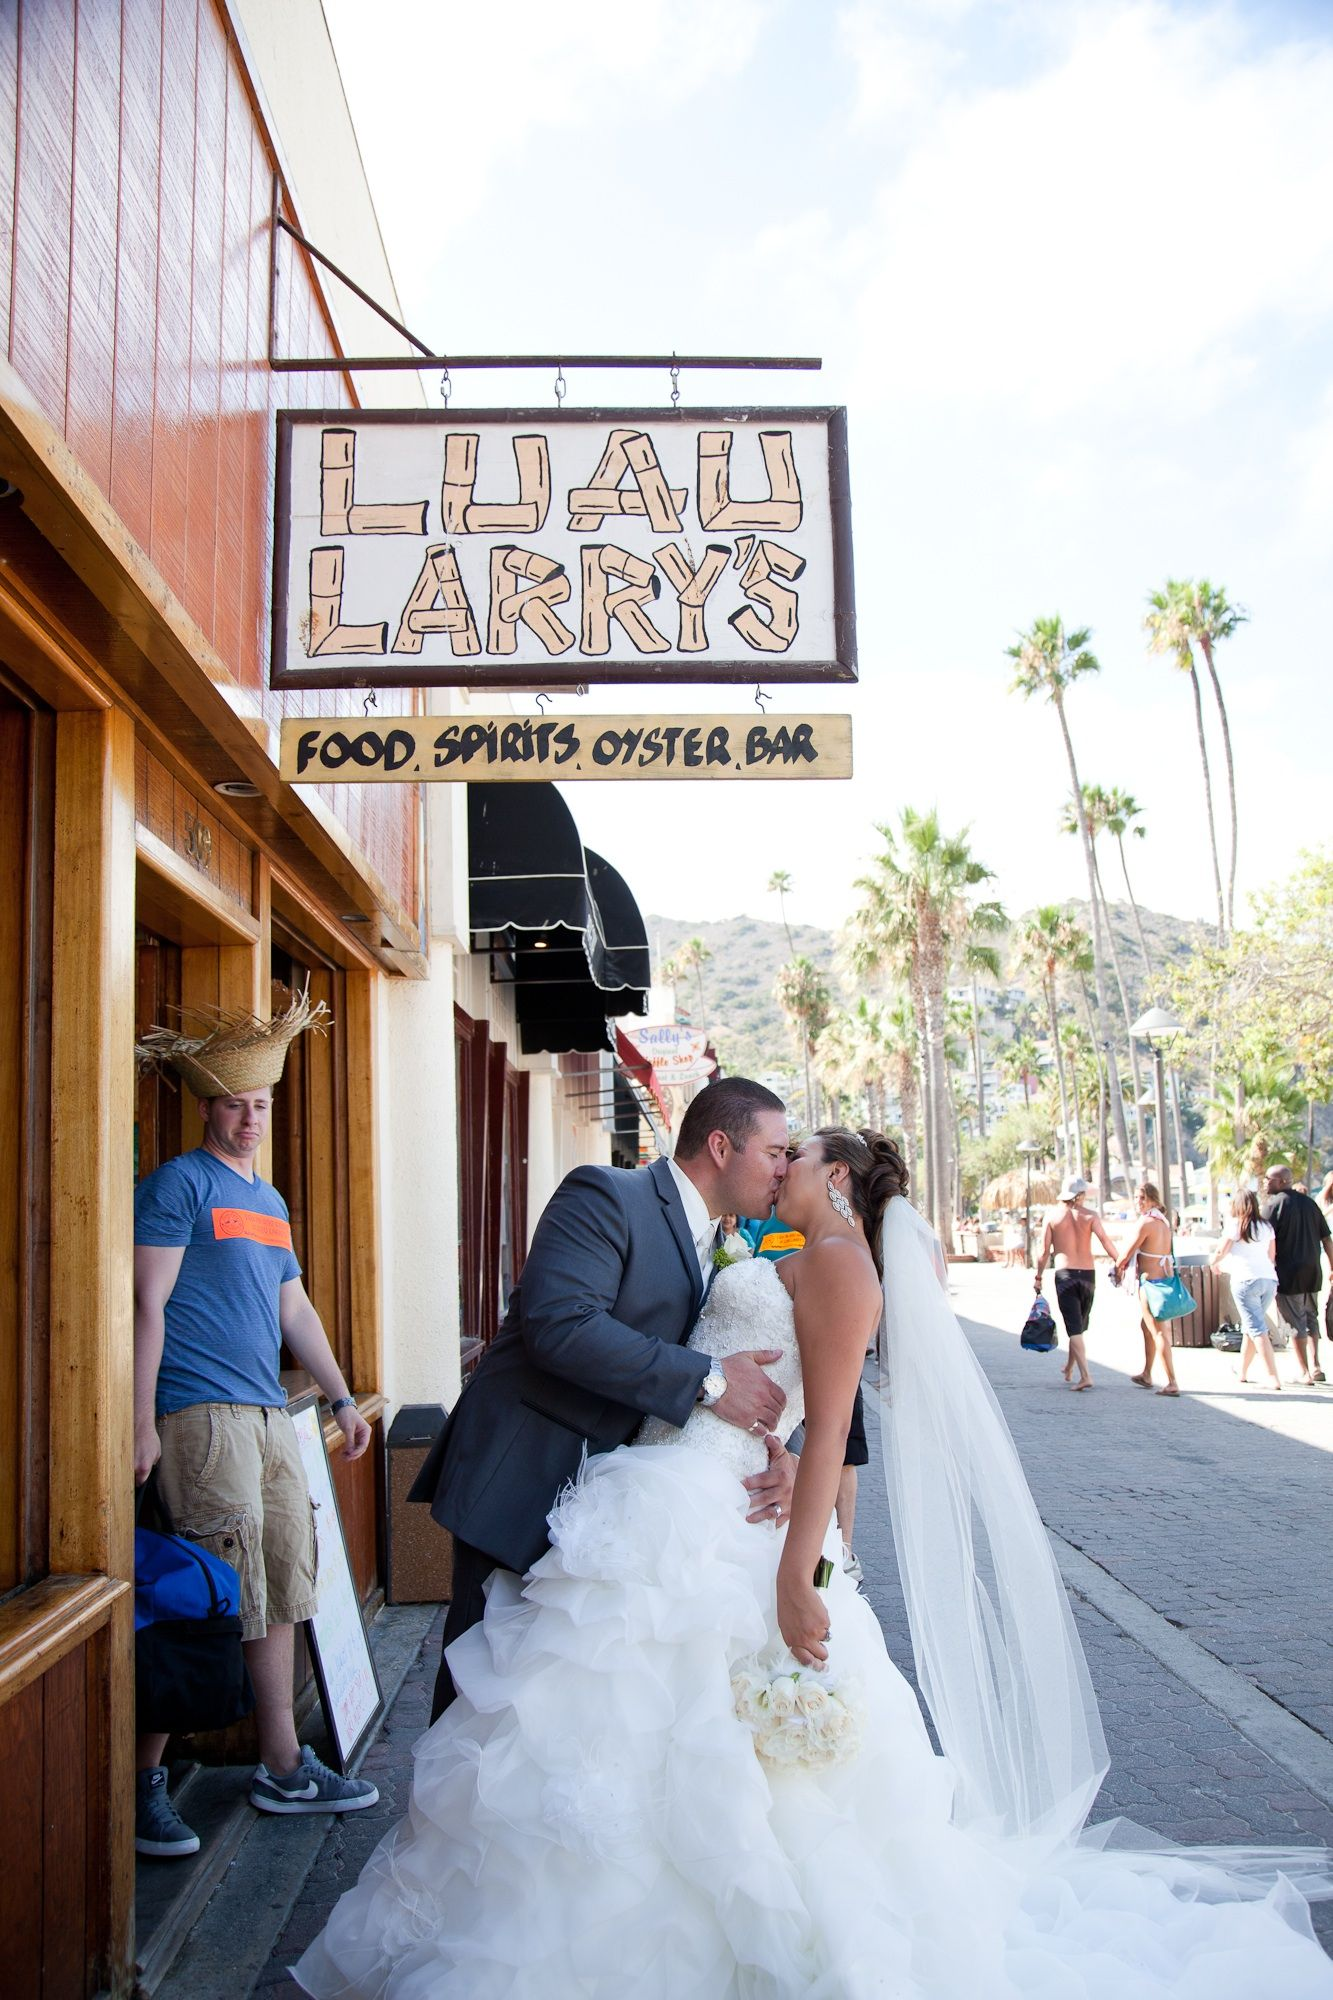 Luau Larry's, Catalina Island, wedding fun! (With images